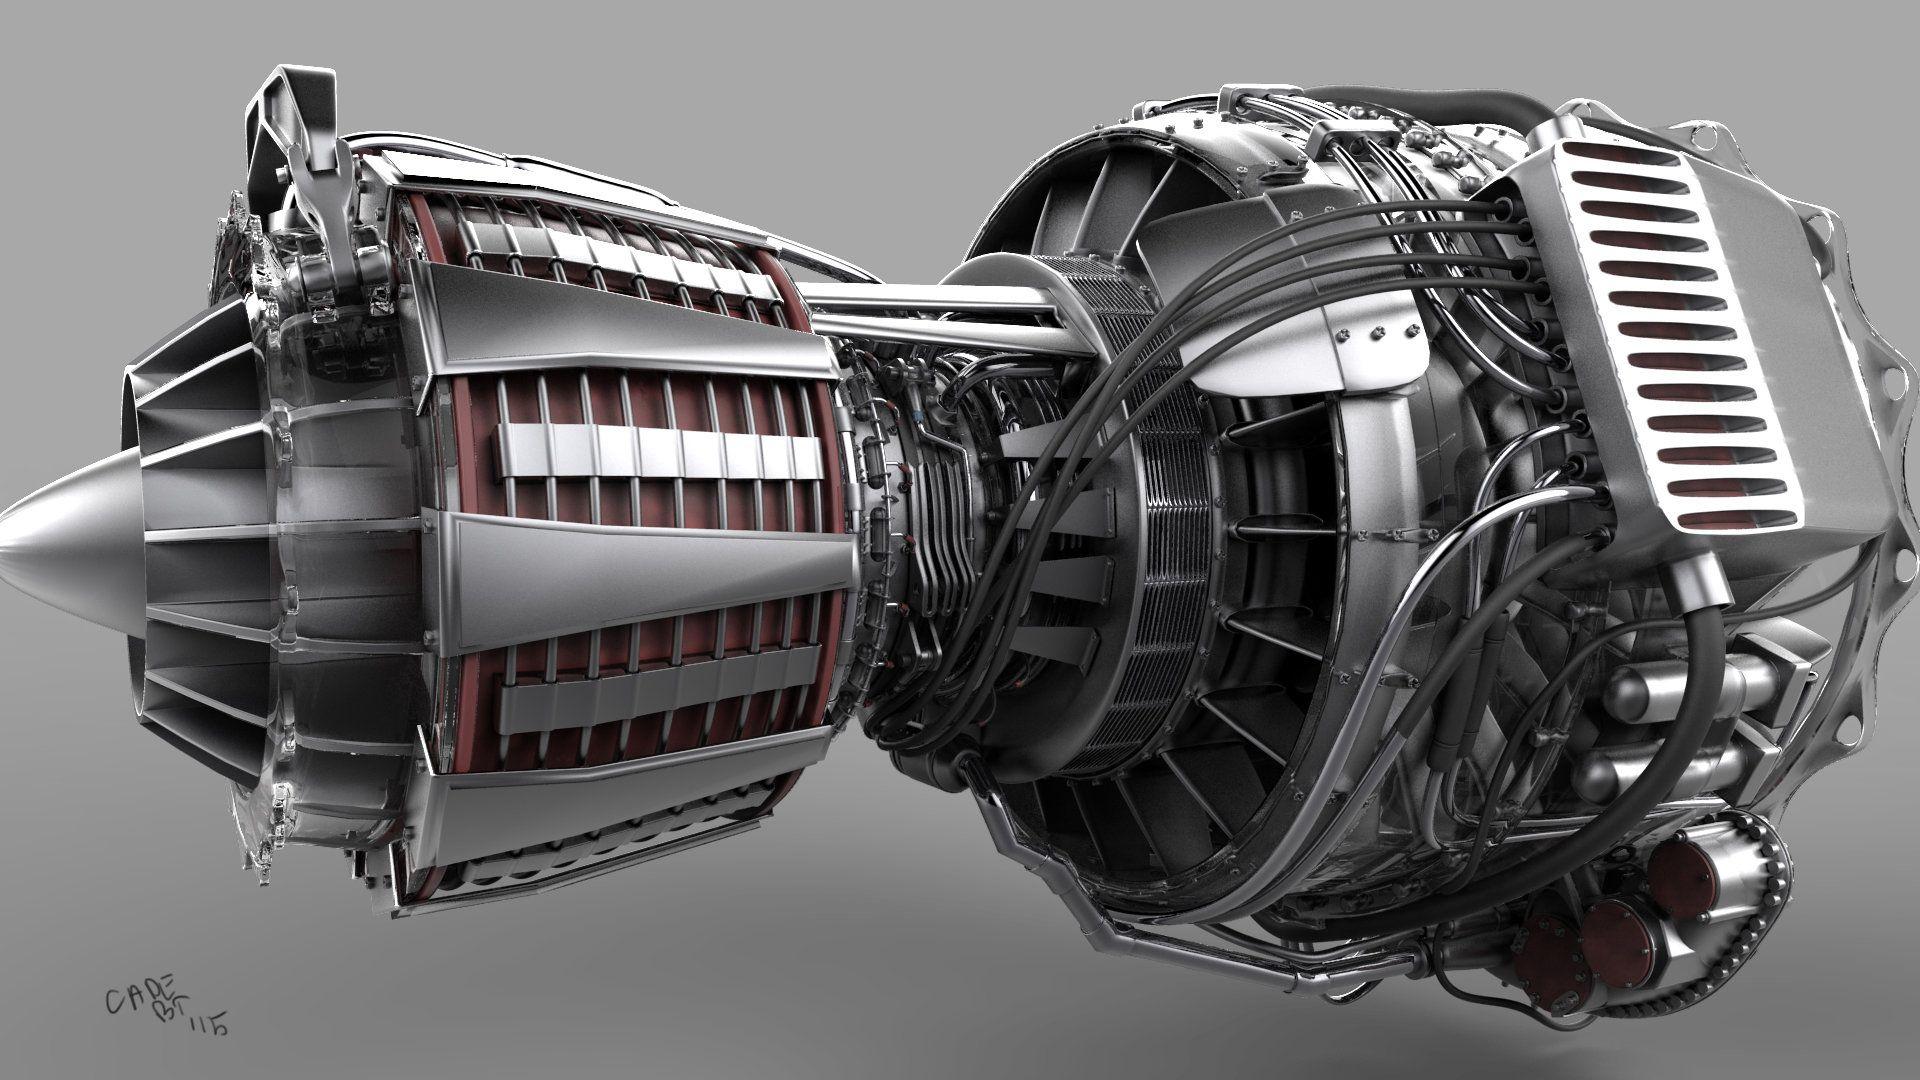 jet engine wallpaper hd